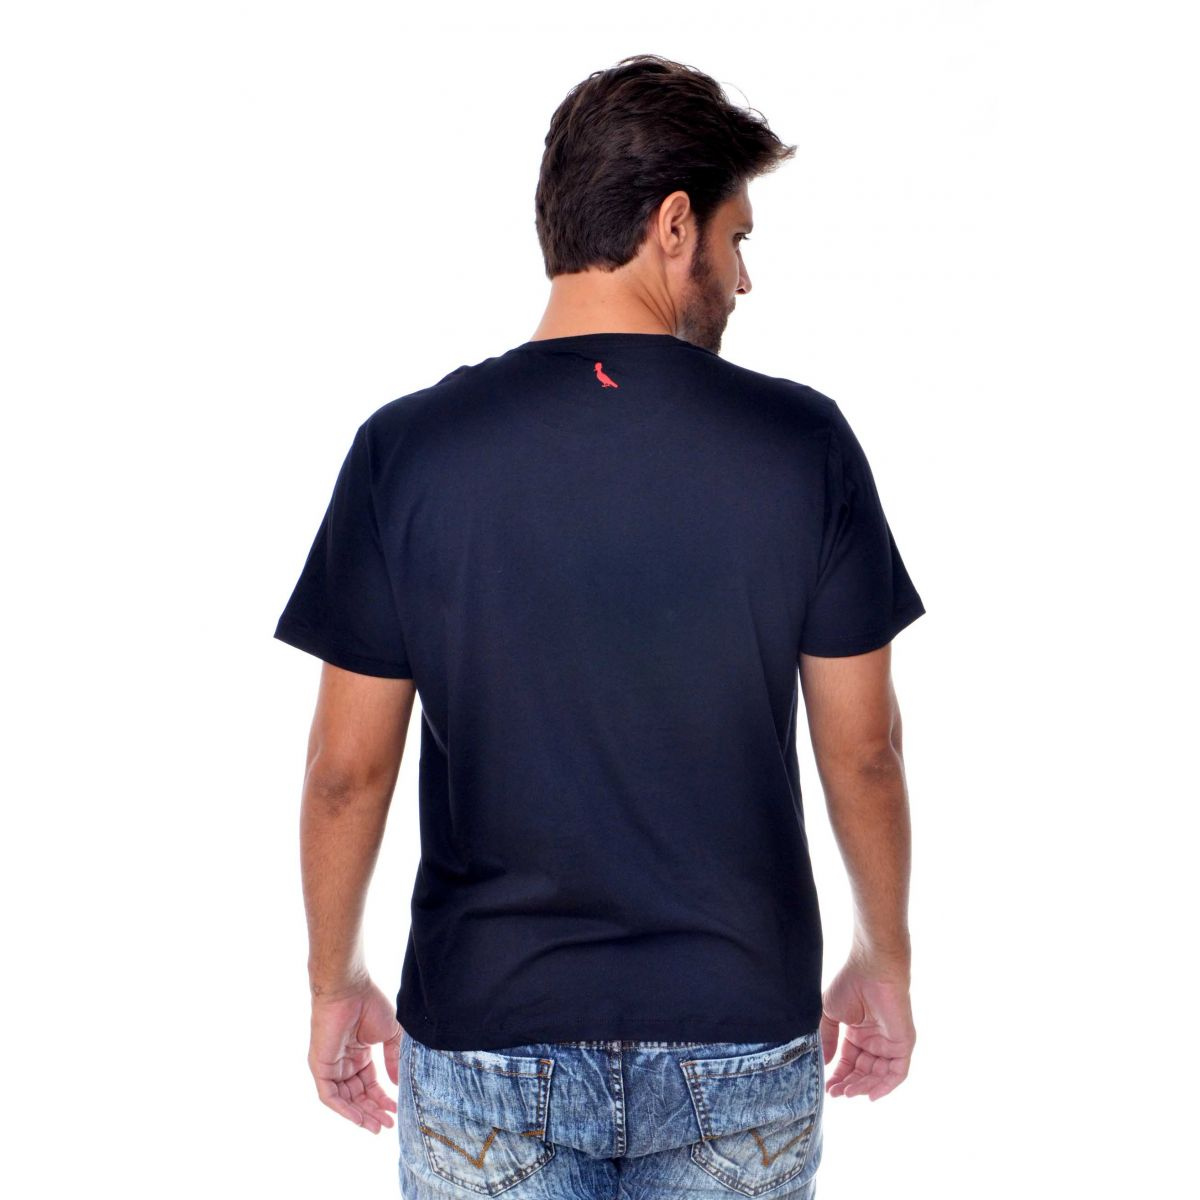 Camiseta Reserva Ha Preta  - Ca Brasileira